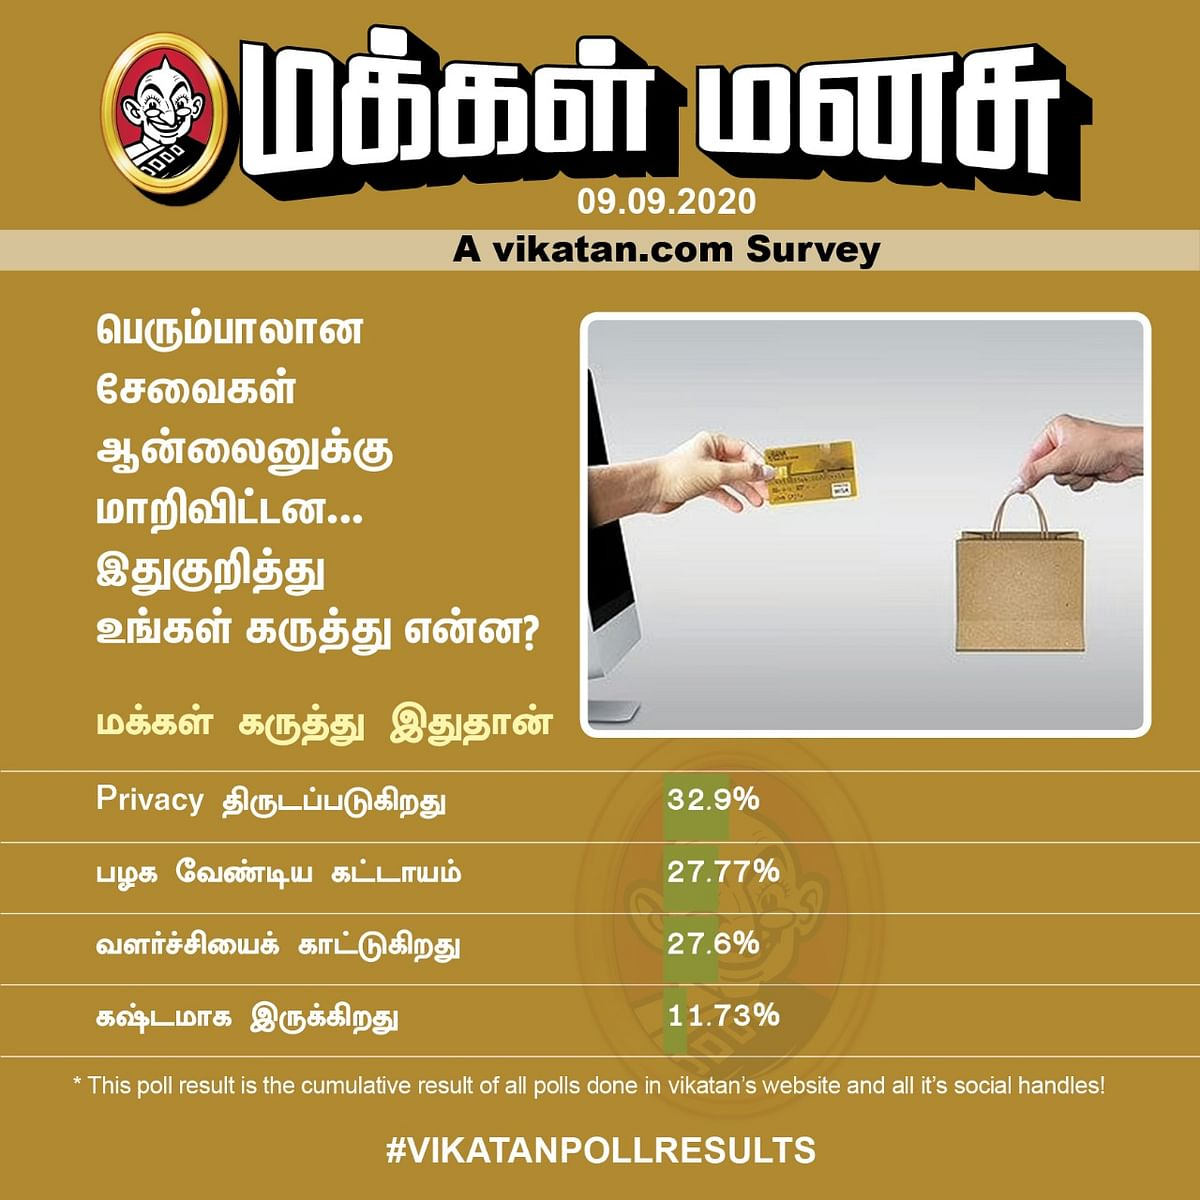 Online Services | Vikatan Poll